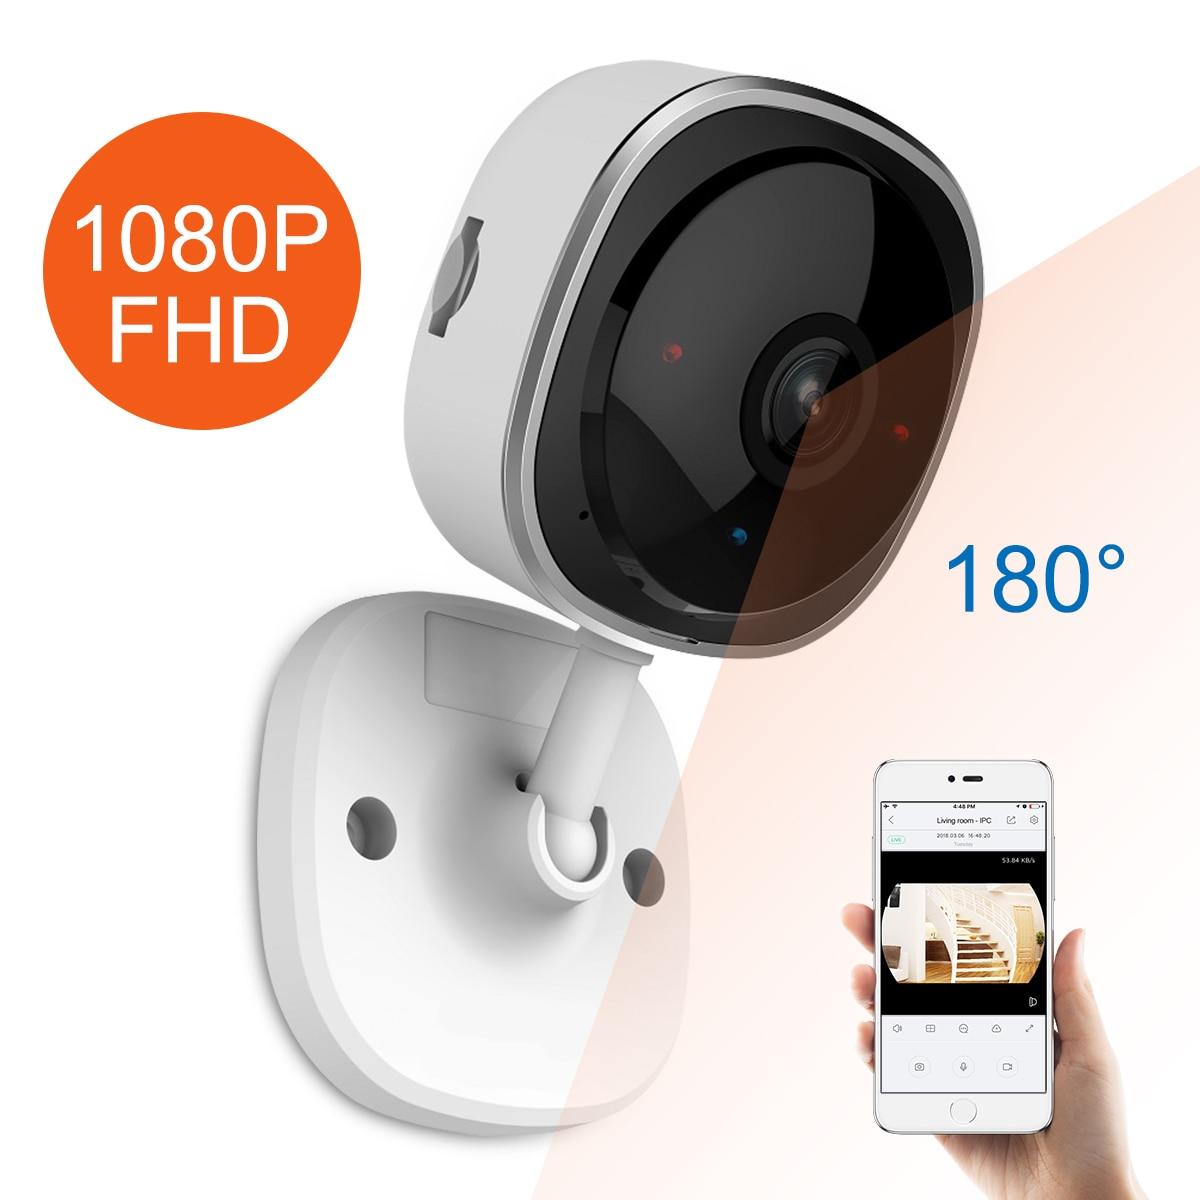 SANNCE HD 1080P рыбий глаз IP камера беспроводная Wi Fi Мини Сеть Камара ночного видения IR Cut домашняя камера безопасности Wi Fi радионяня-in Камеры видеонаблюдения from Безопасность и защита